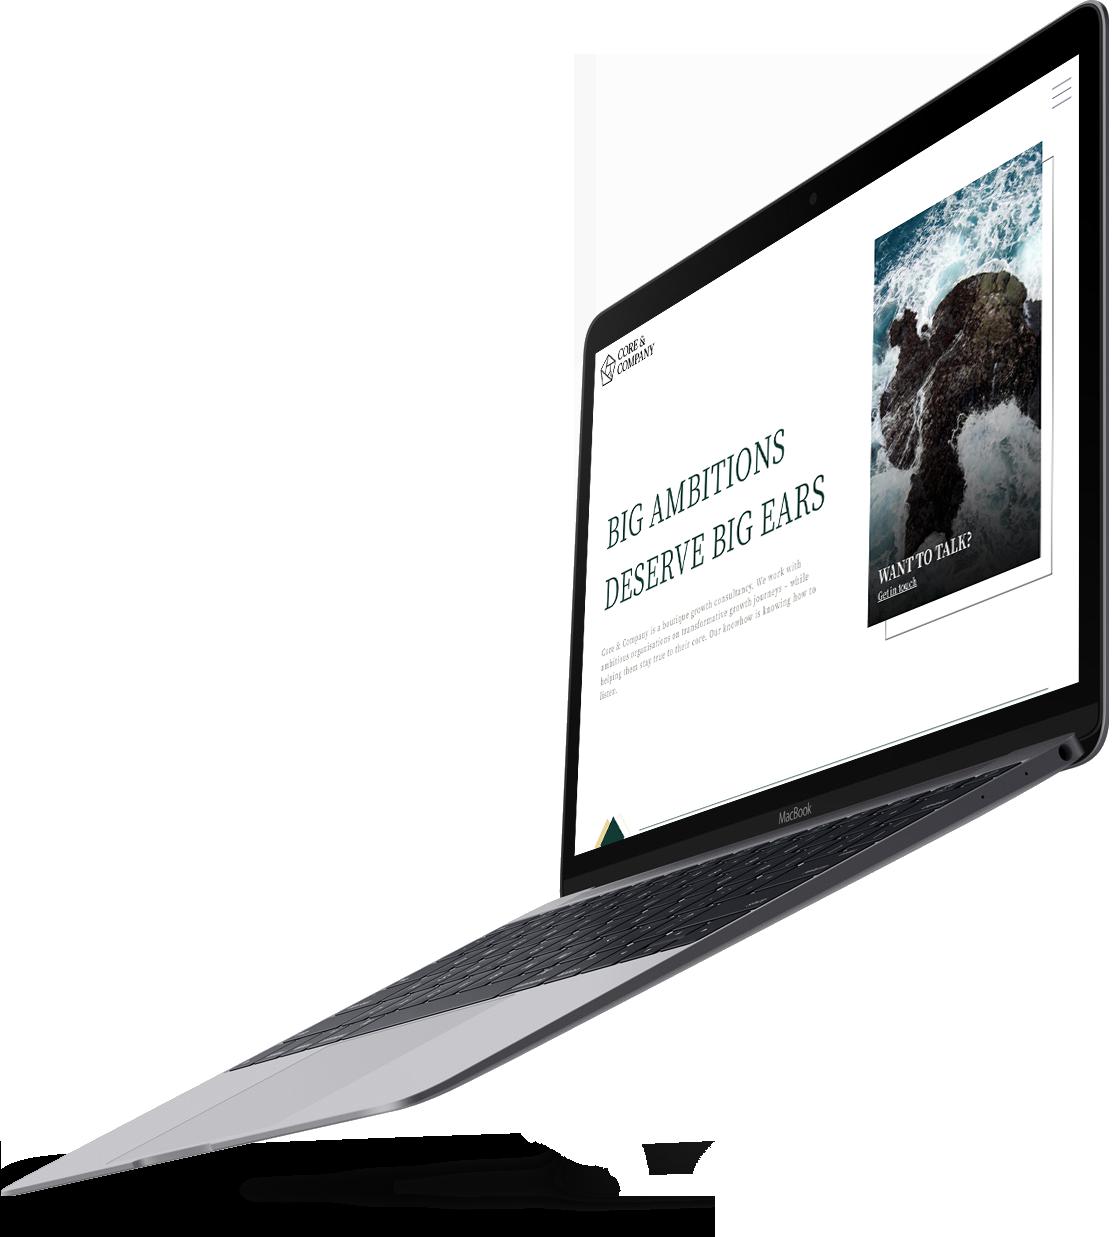 webdesign-topic-image